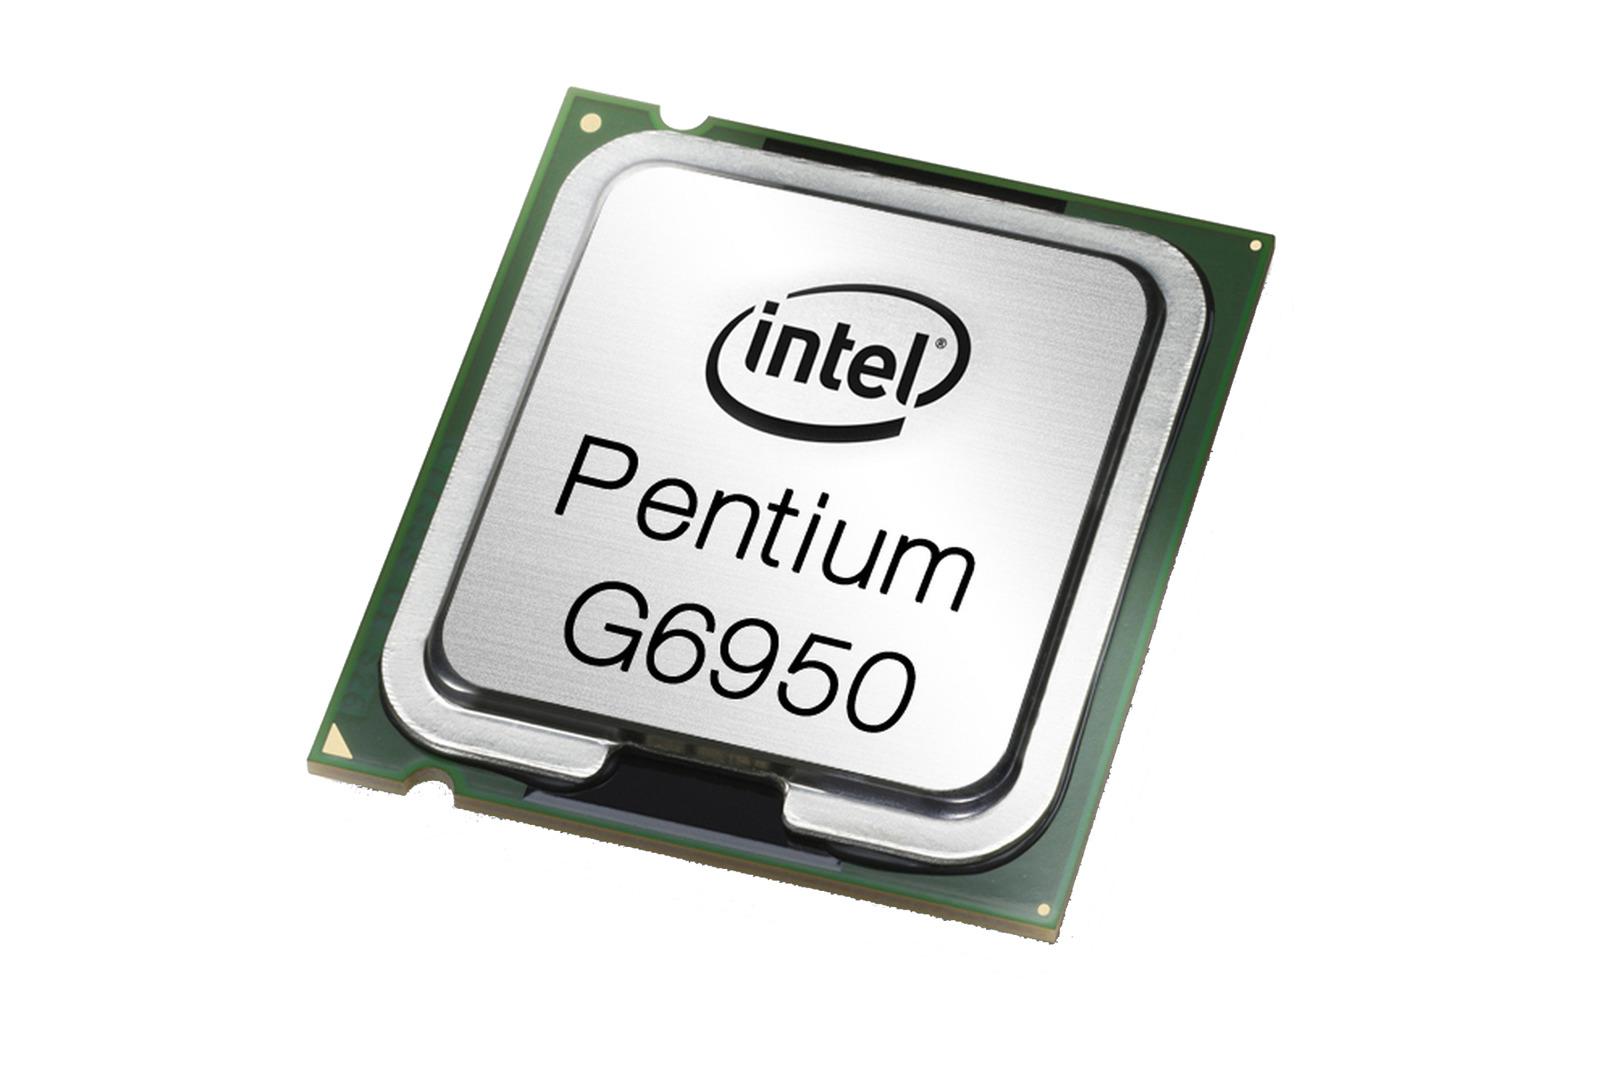 Processor Intel Pentium Dual-Core G6950 2.8GHz 3MB FCLGA1156